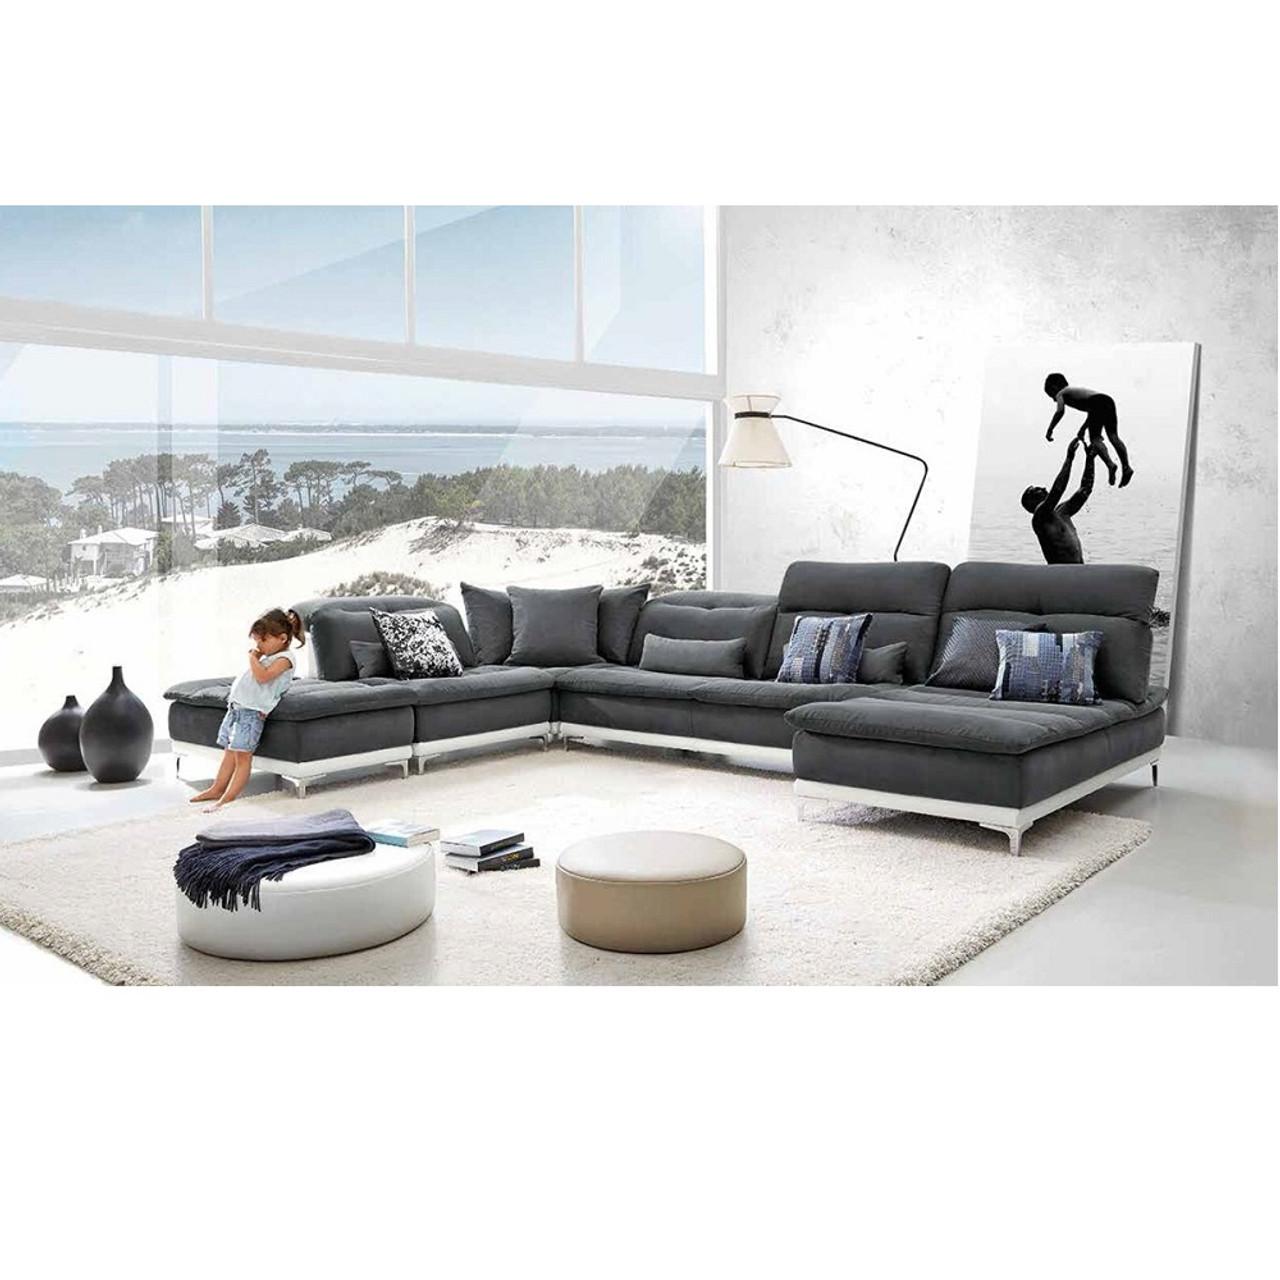 Admirable David Ferrari Horizon Modern Grey Fabric Leather Sectional Sofa Pabps2019 Chair Design Images Pabps2019Com